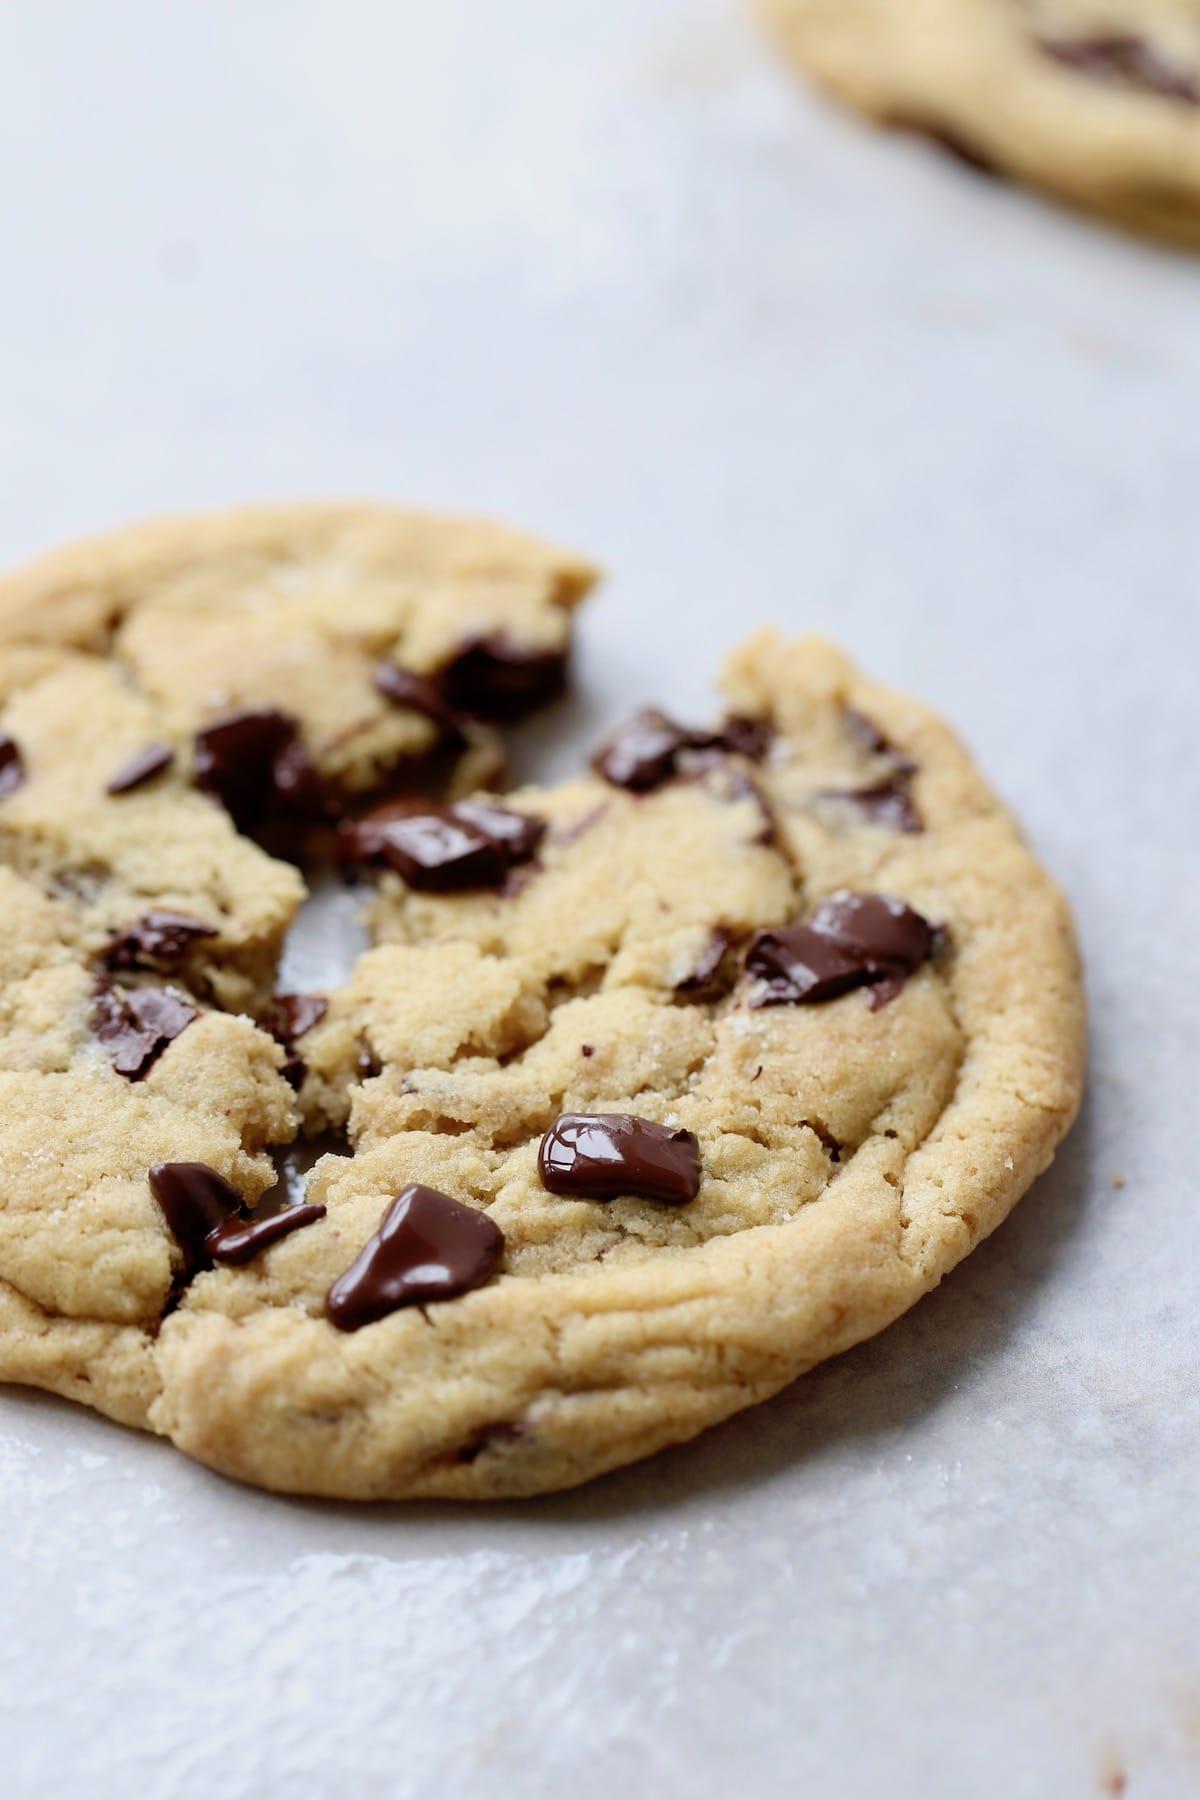 a broken chocolate chip cookies